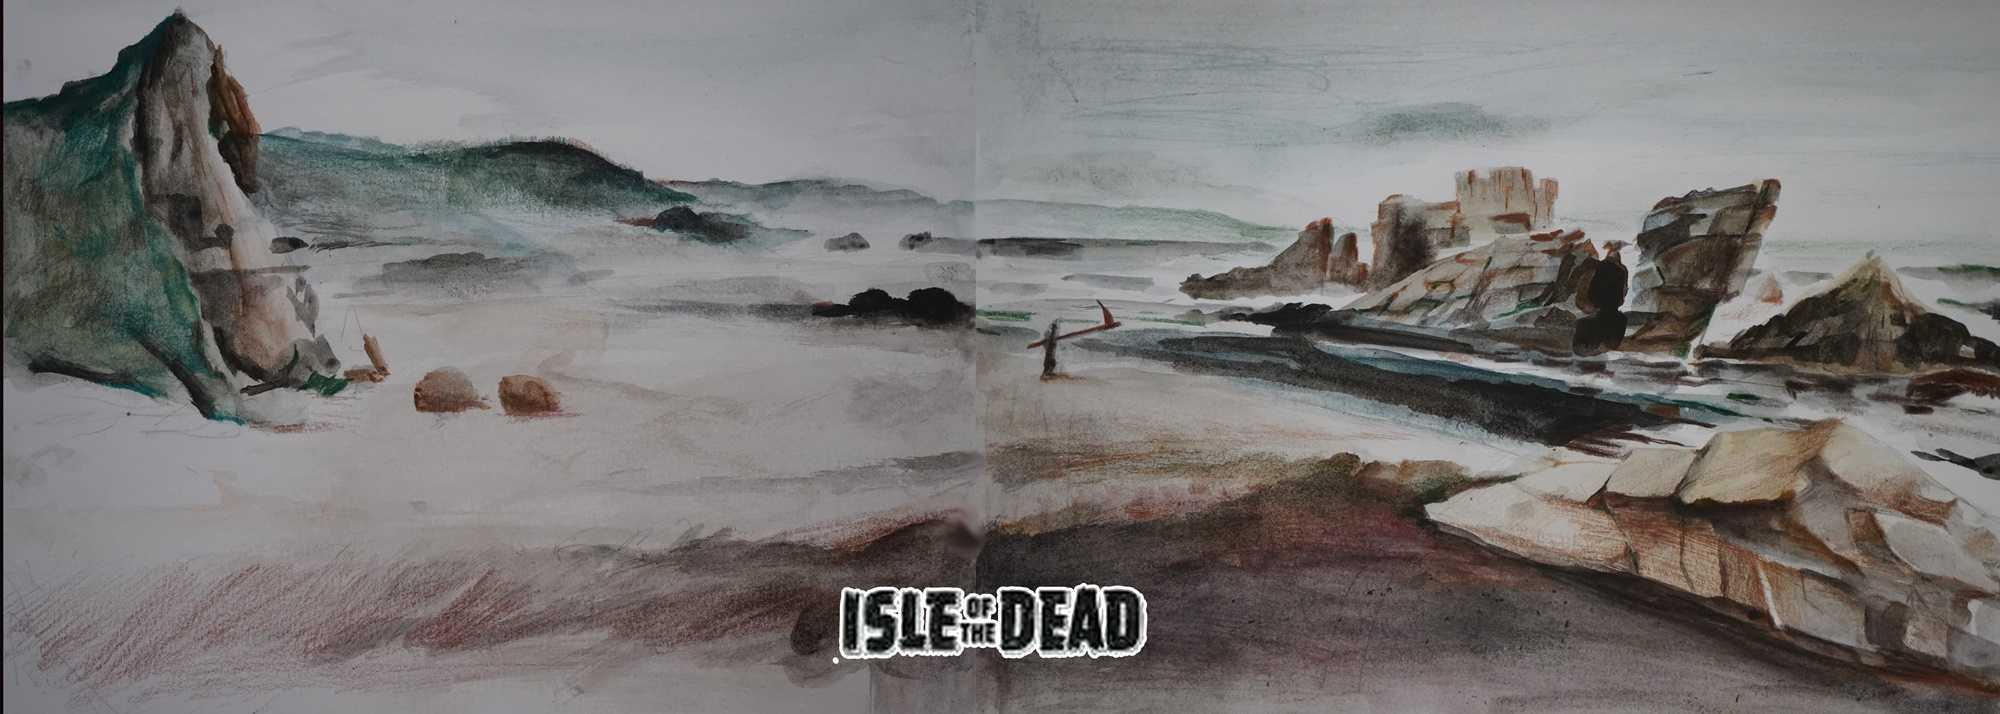 Isle of the Death